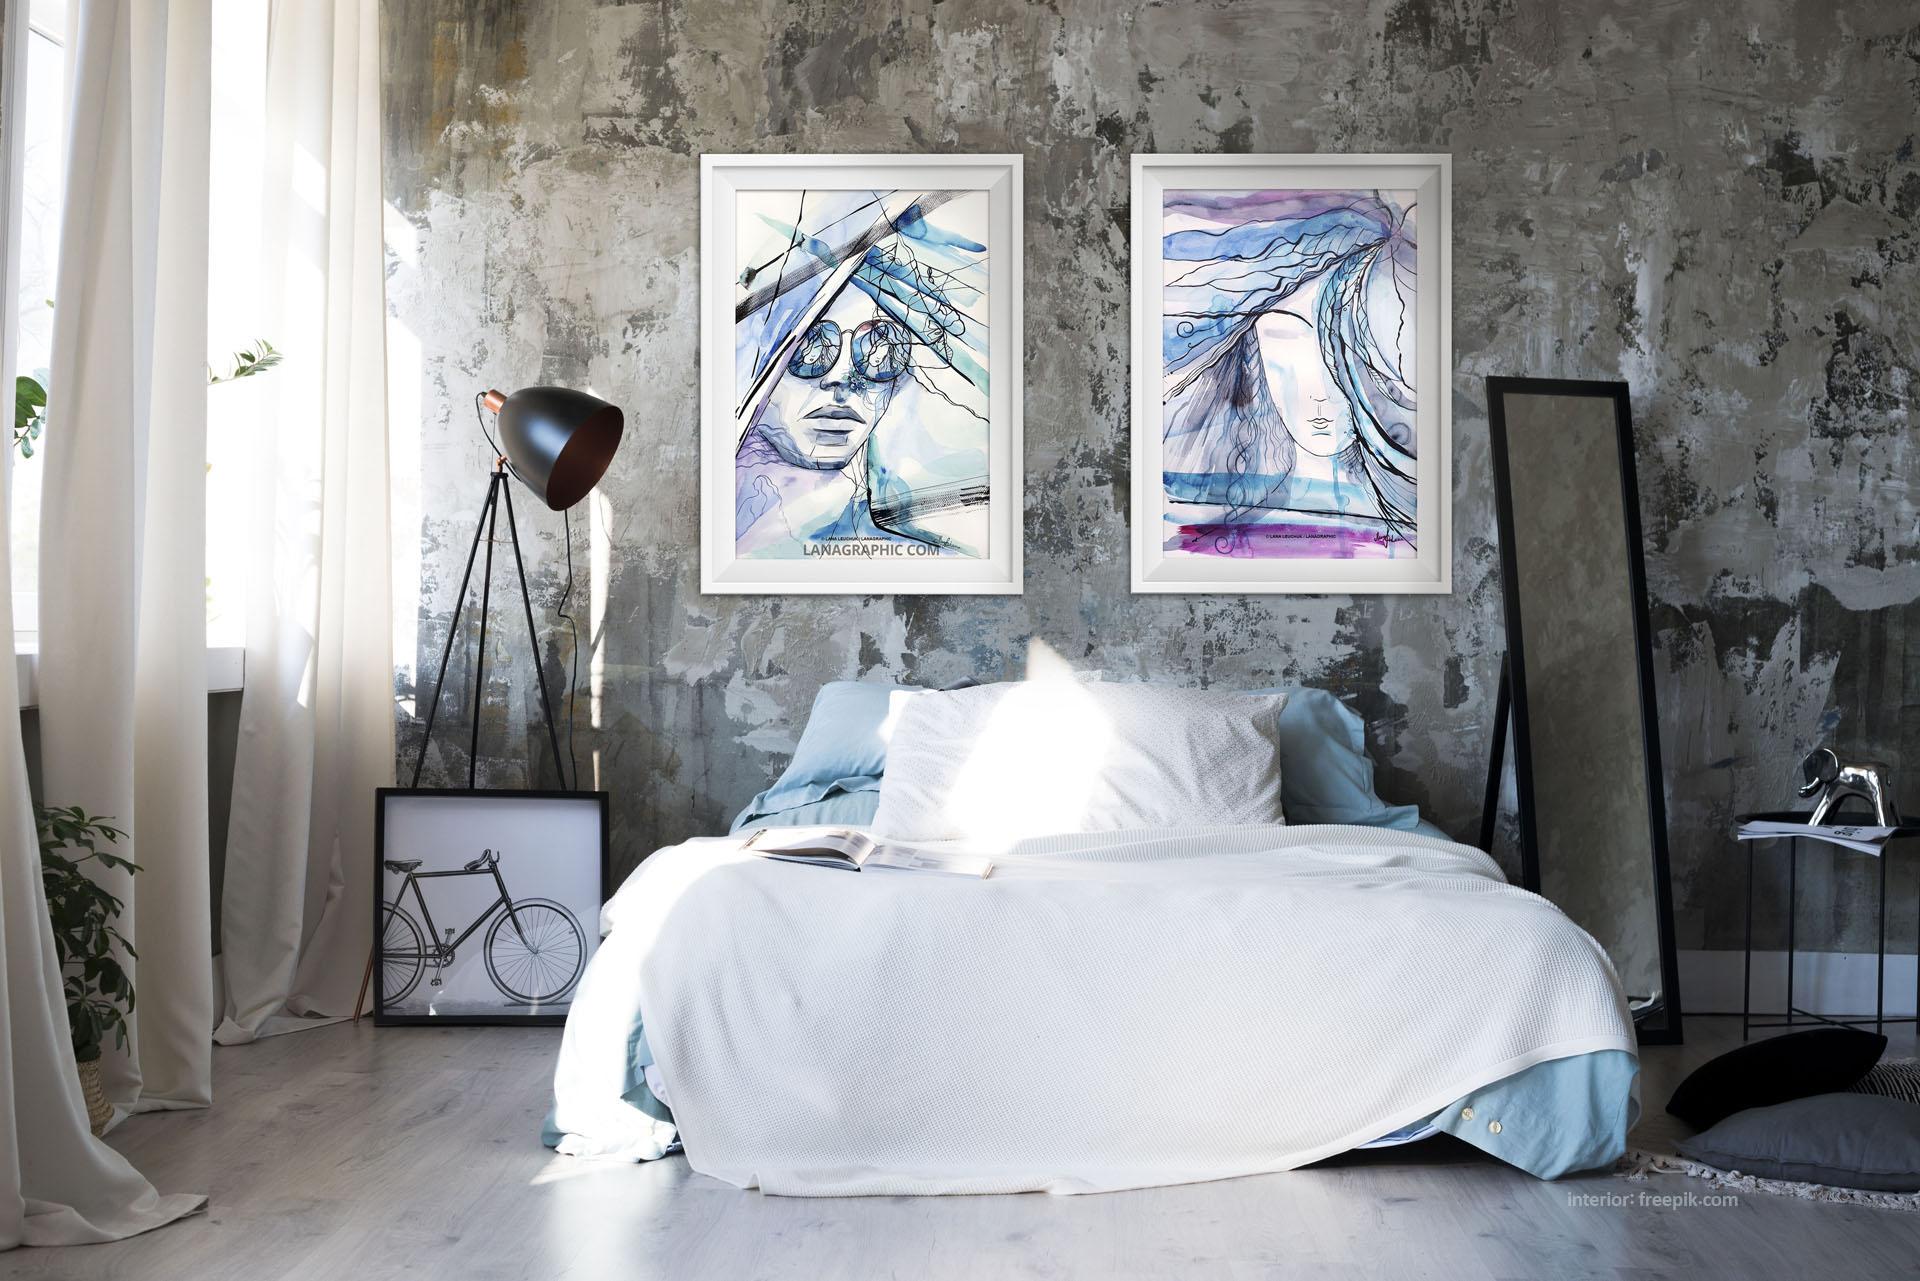 artwork-in-interior-art by Lana Leuchuk-lanagraphic